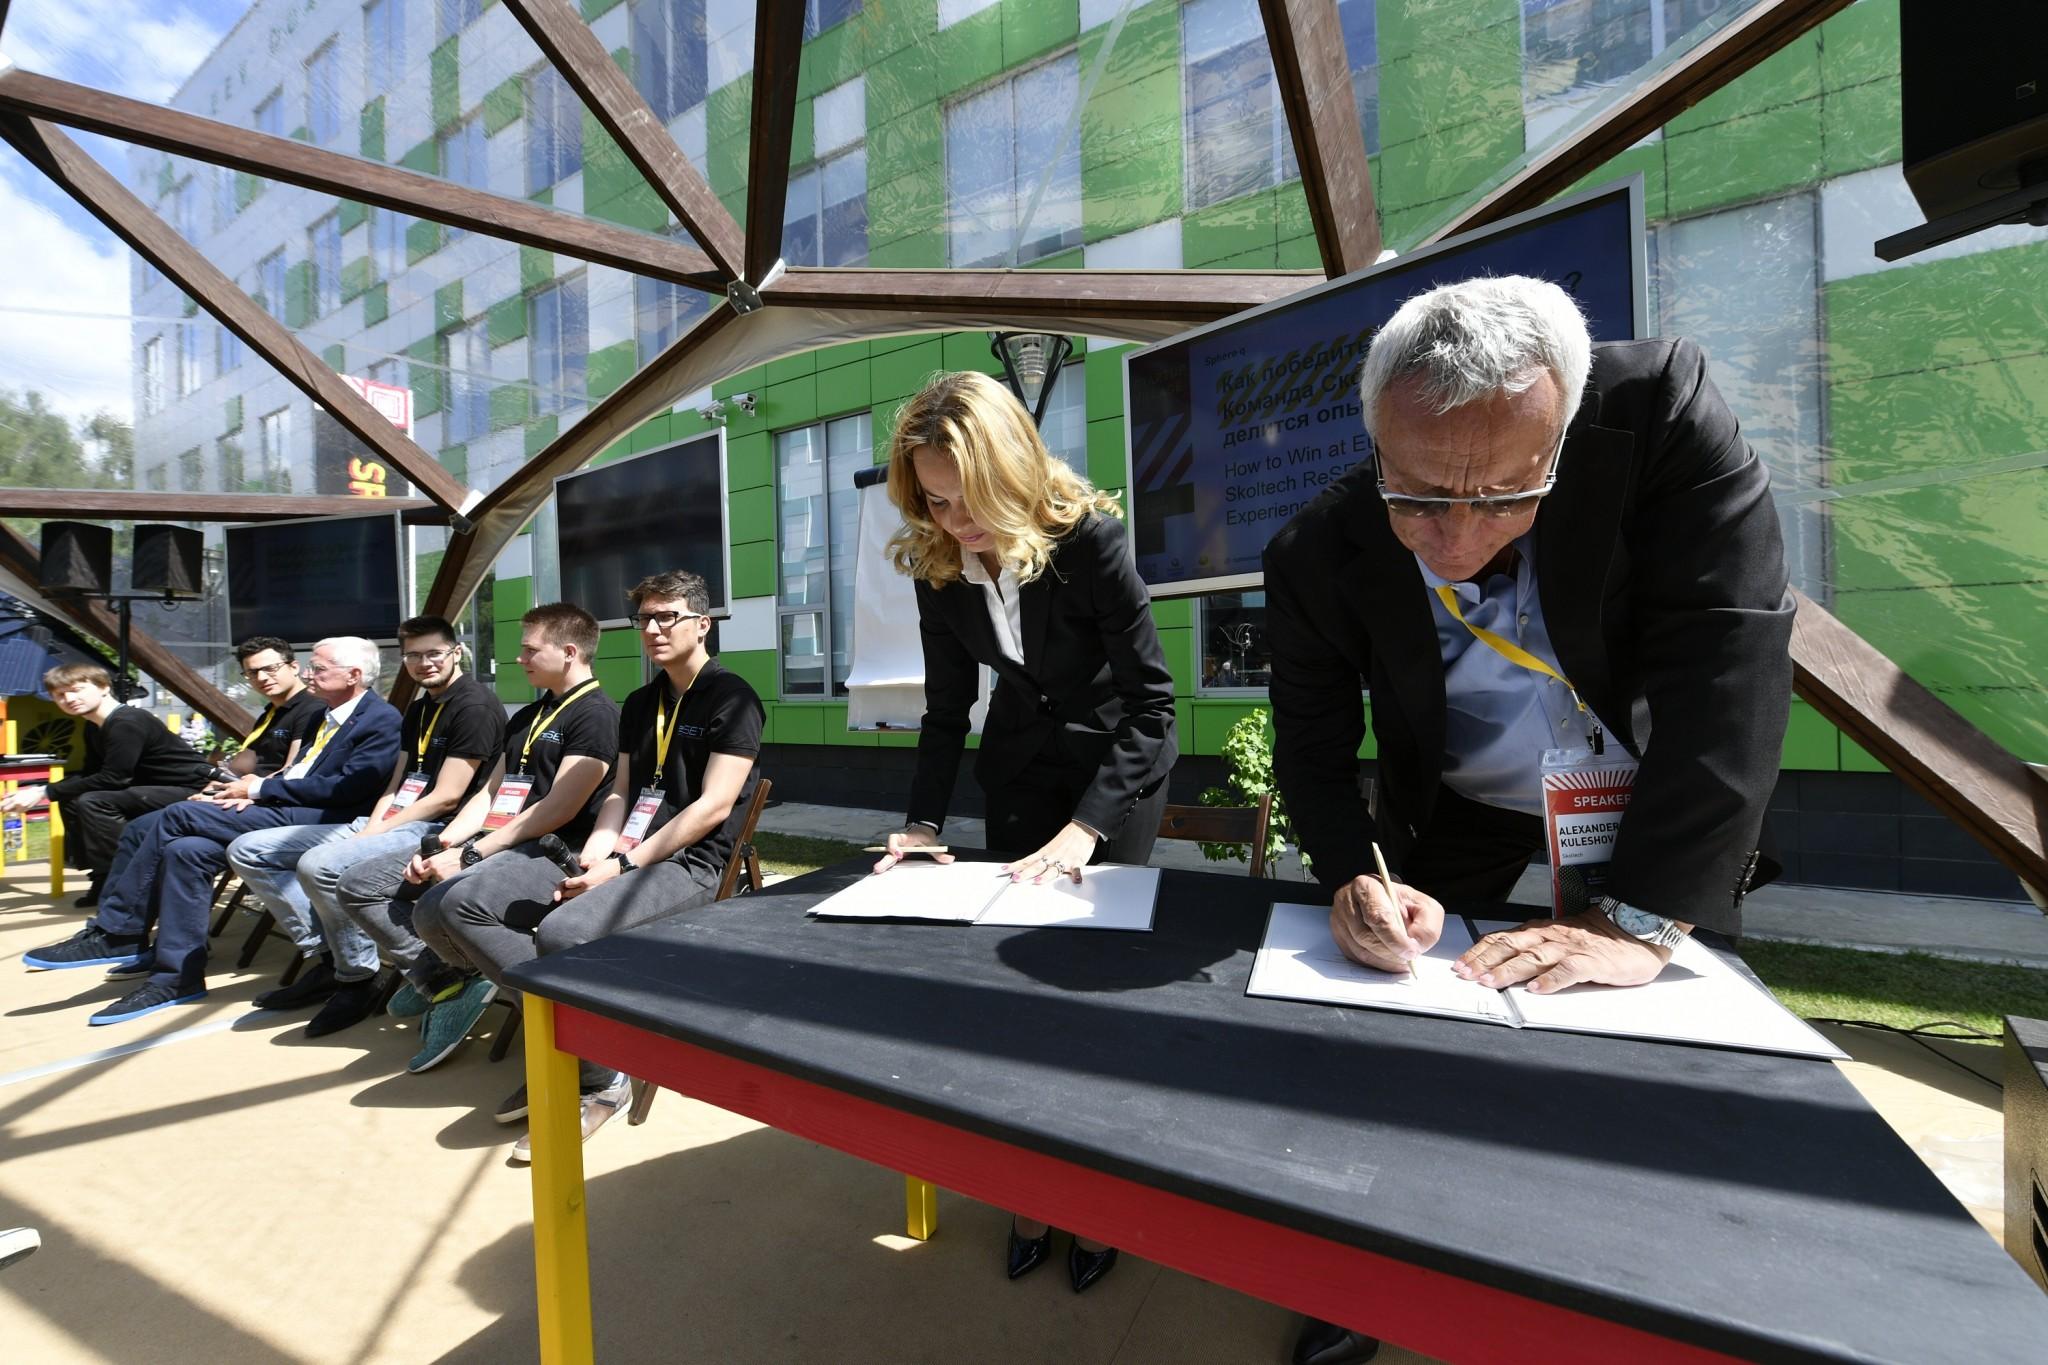 Skoltech President Kuleshov and Android Technics Deputy General Director Djamilia Chaikina sign a memorandum of understanding during a panel at the Skolkovo Startup Village.